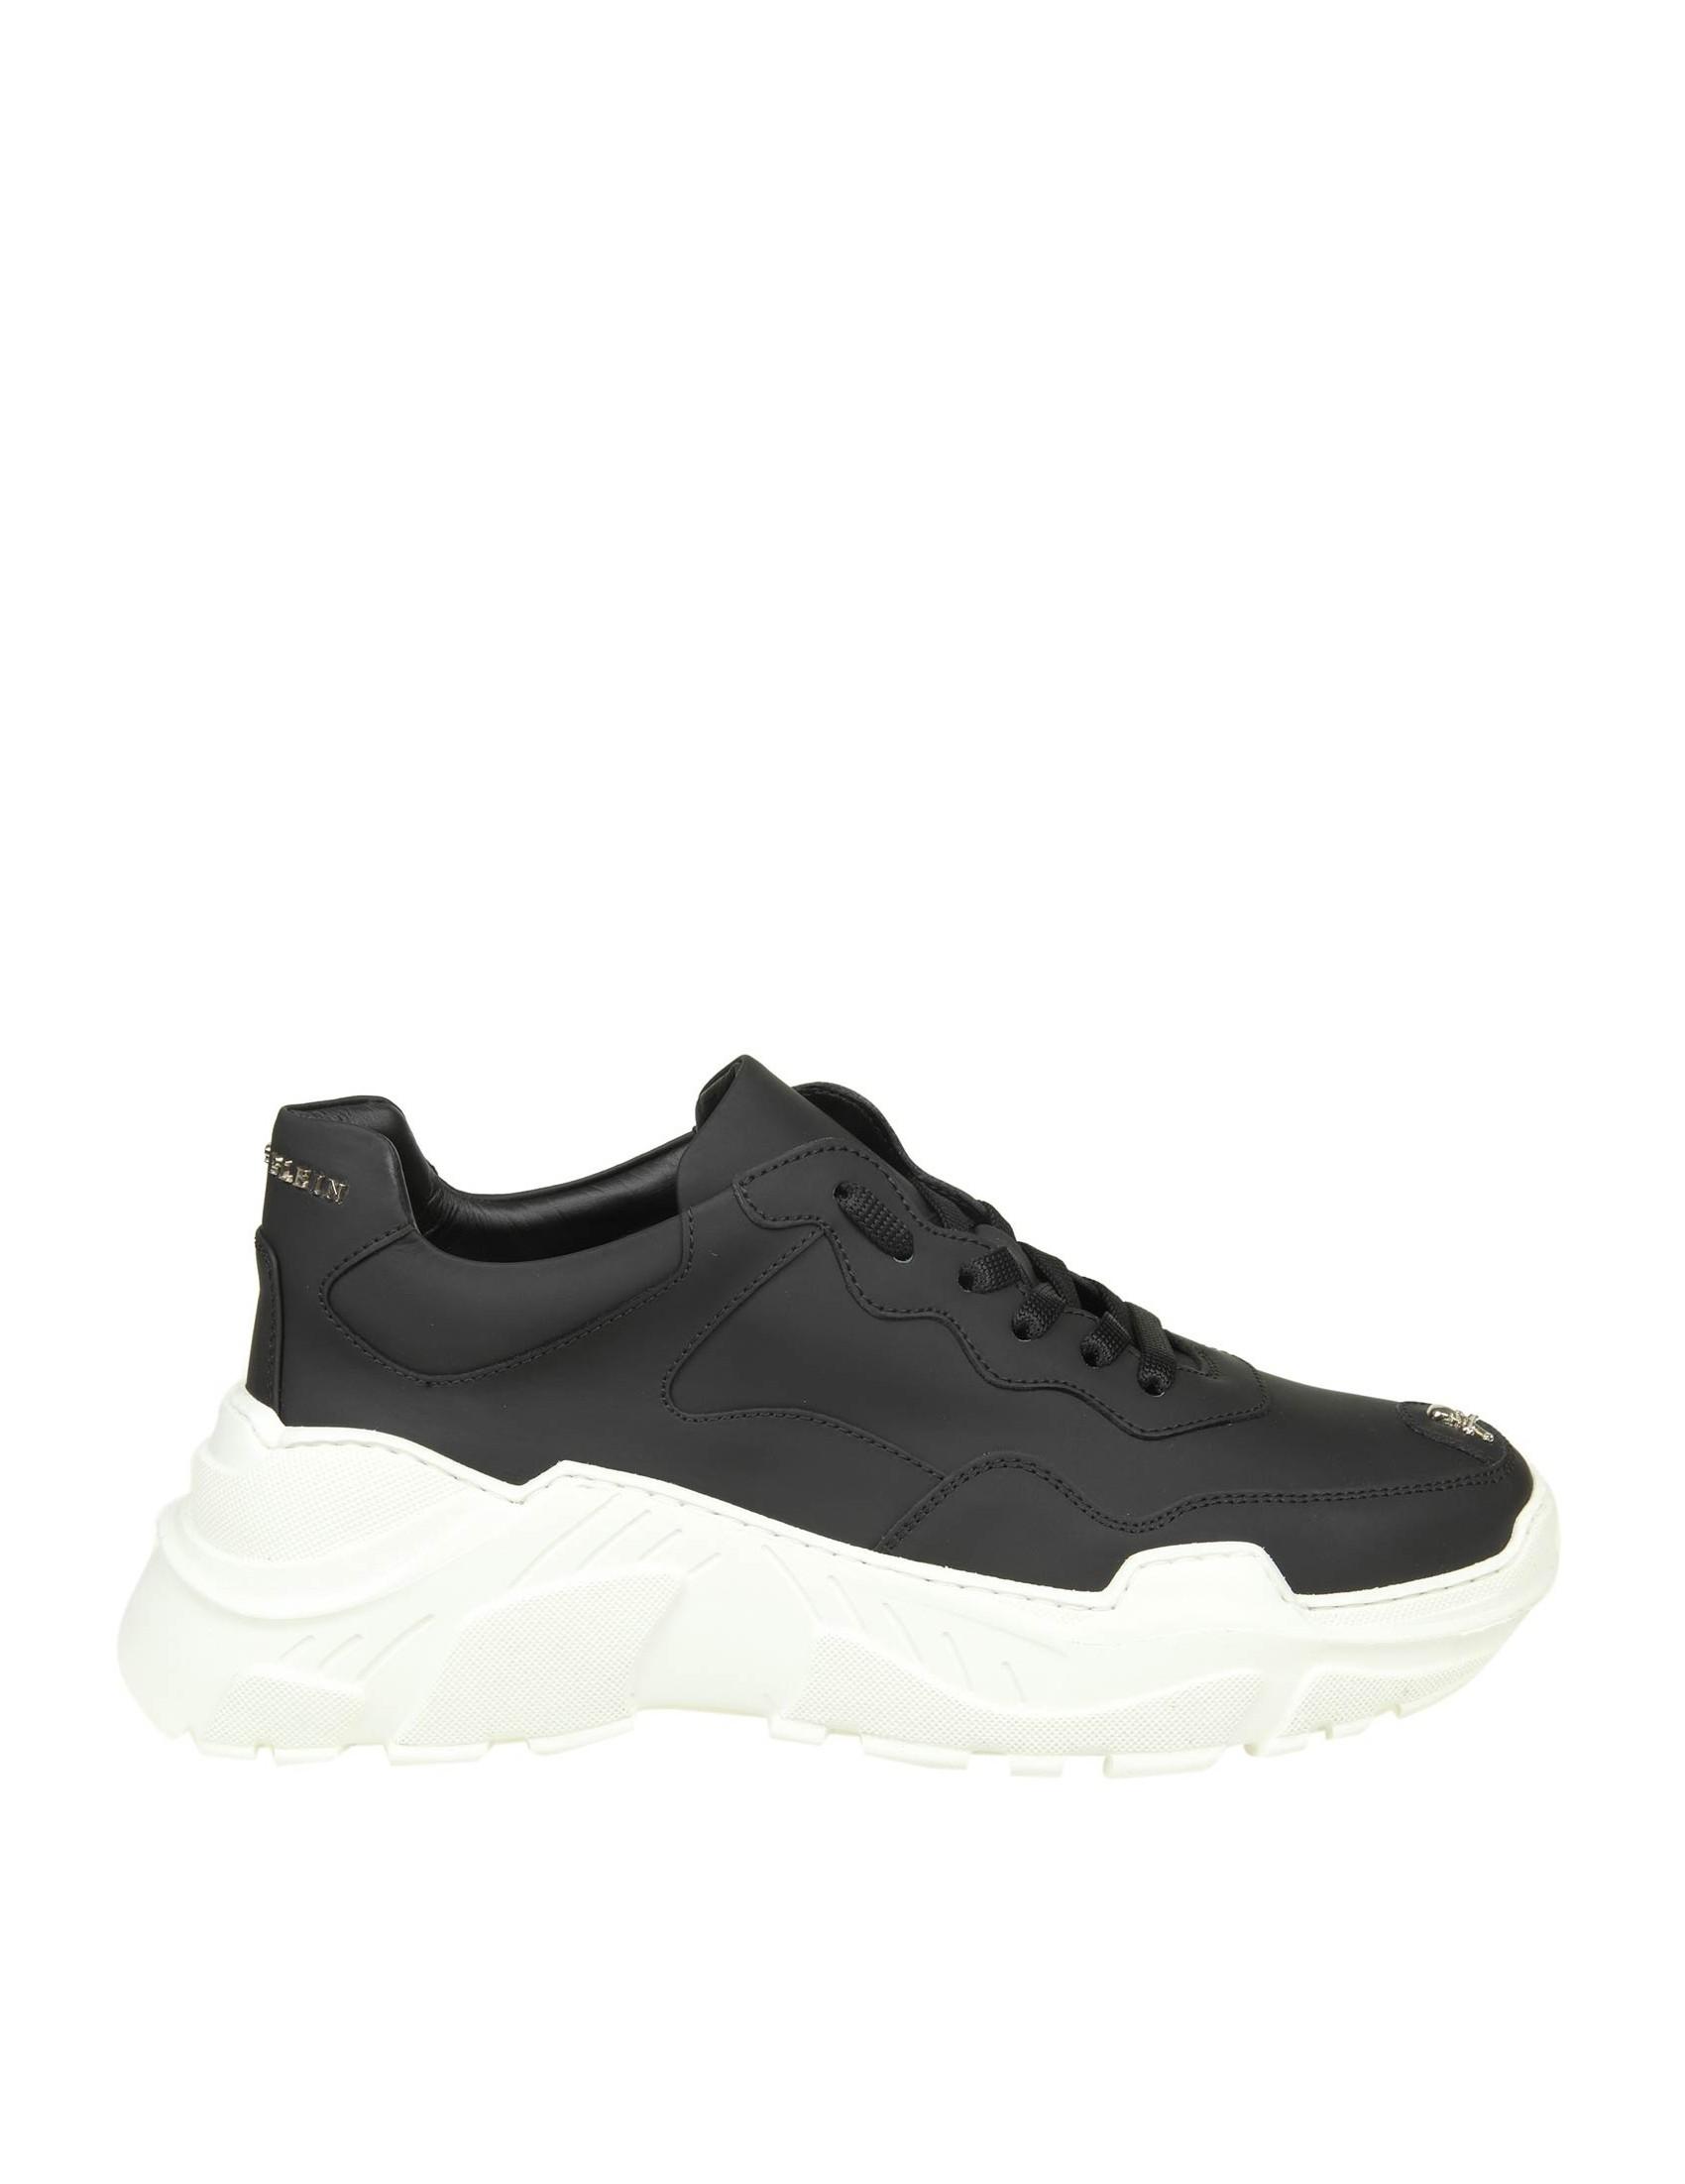 newest collection 88d61 d026e philipp-plein-sneakers-runner-original-in-pelle-nera.jpg